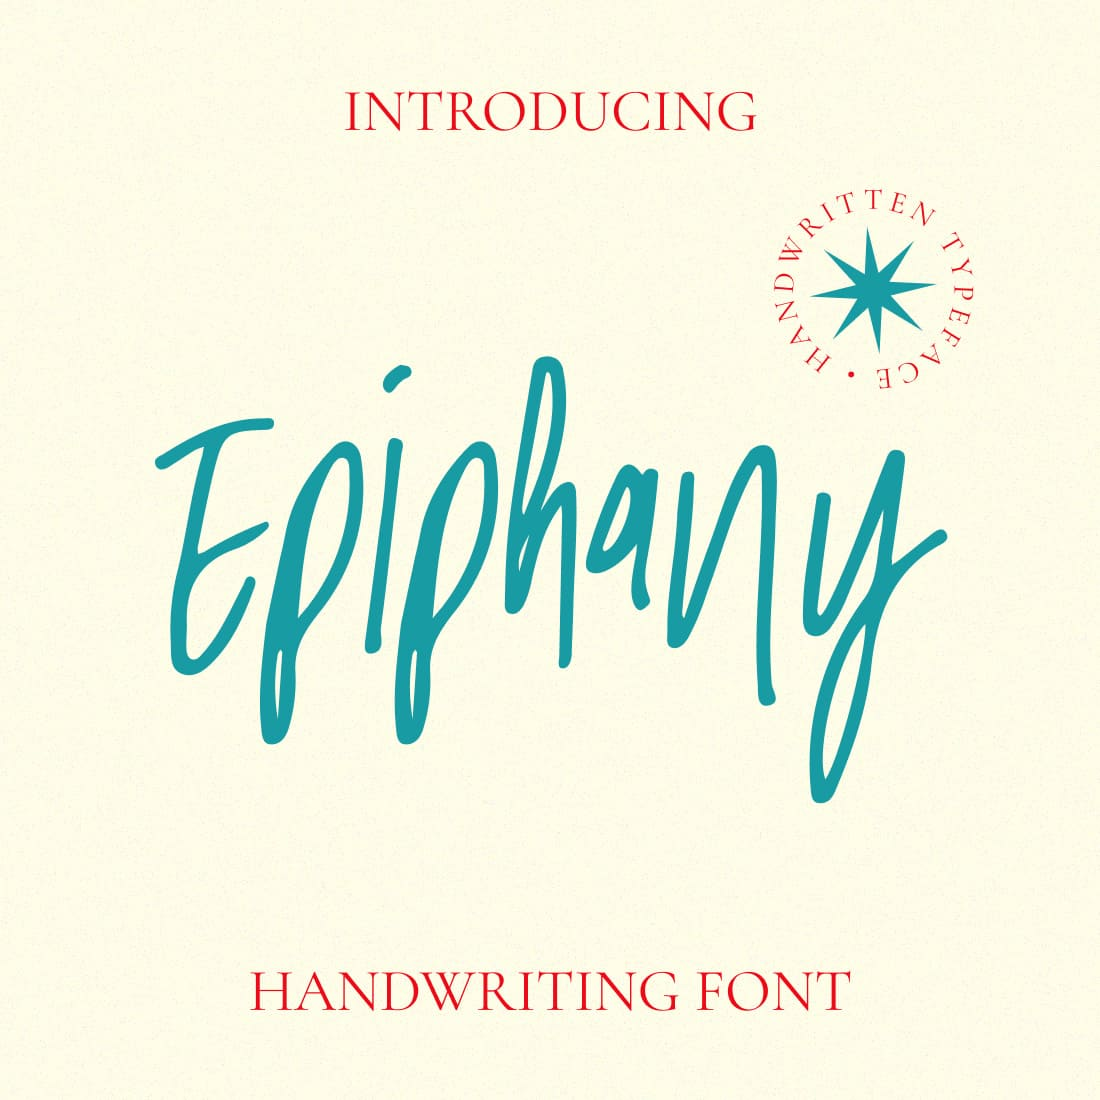 Epiphany Handwriting Font Main Collage Image by MasterBundles.